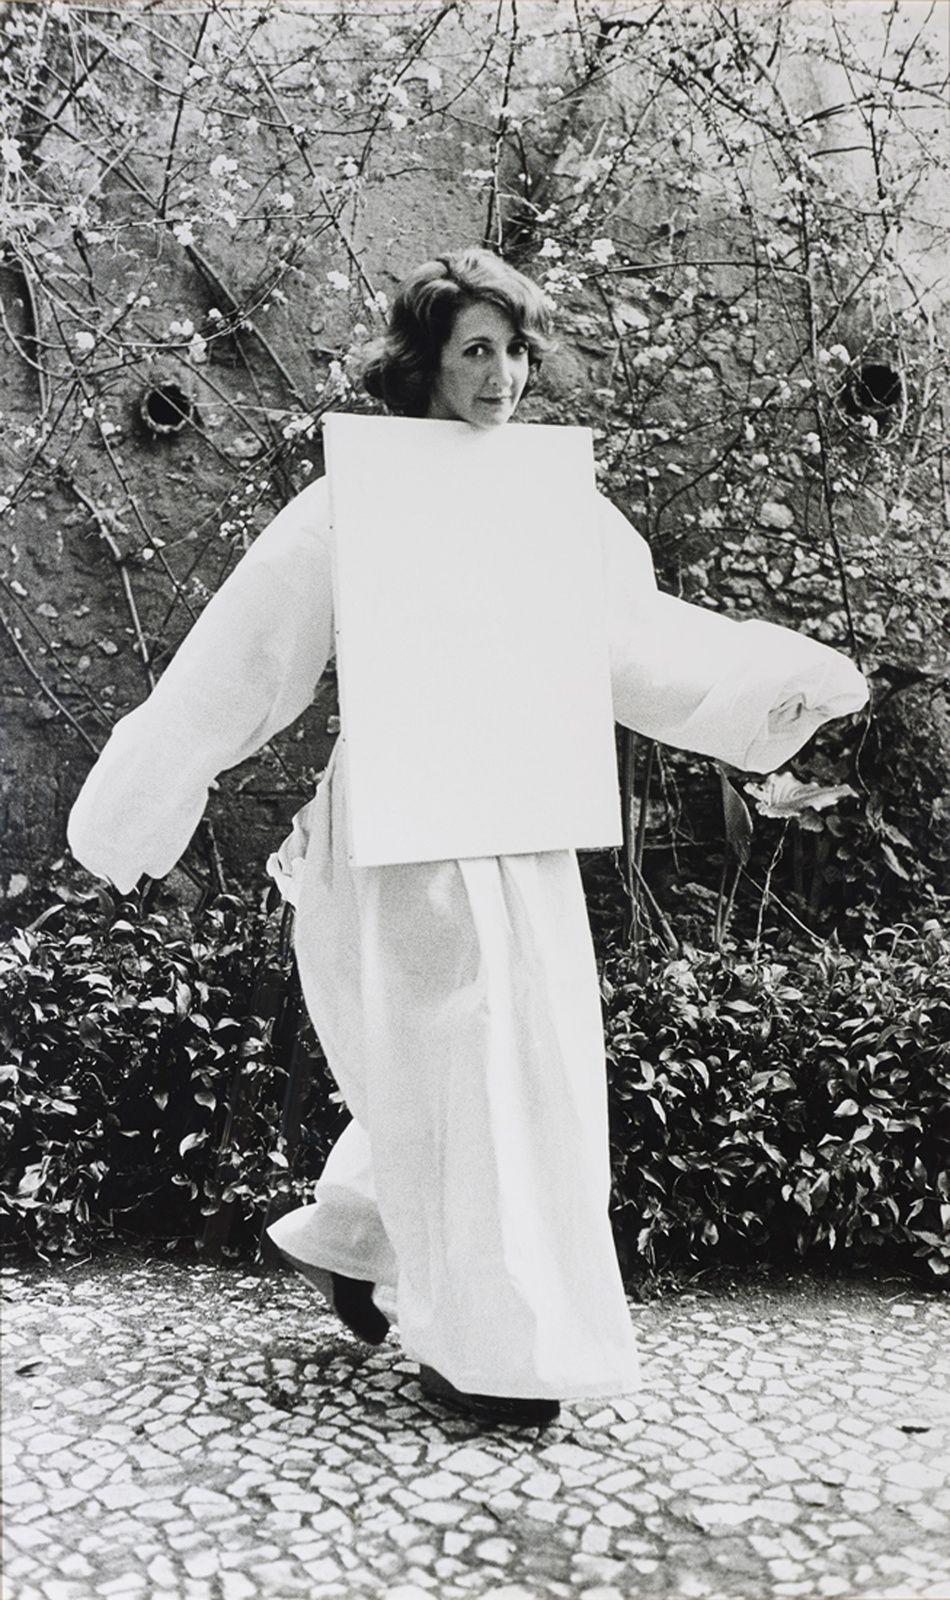 """ela habitada [Toile habitée]"", 1976 d'Helena Almeida - Courtesy Jeu de Paume Paris"